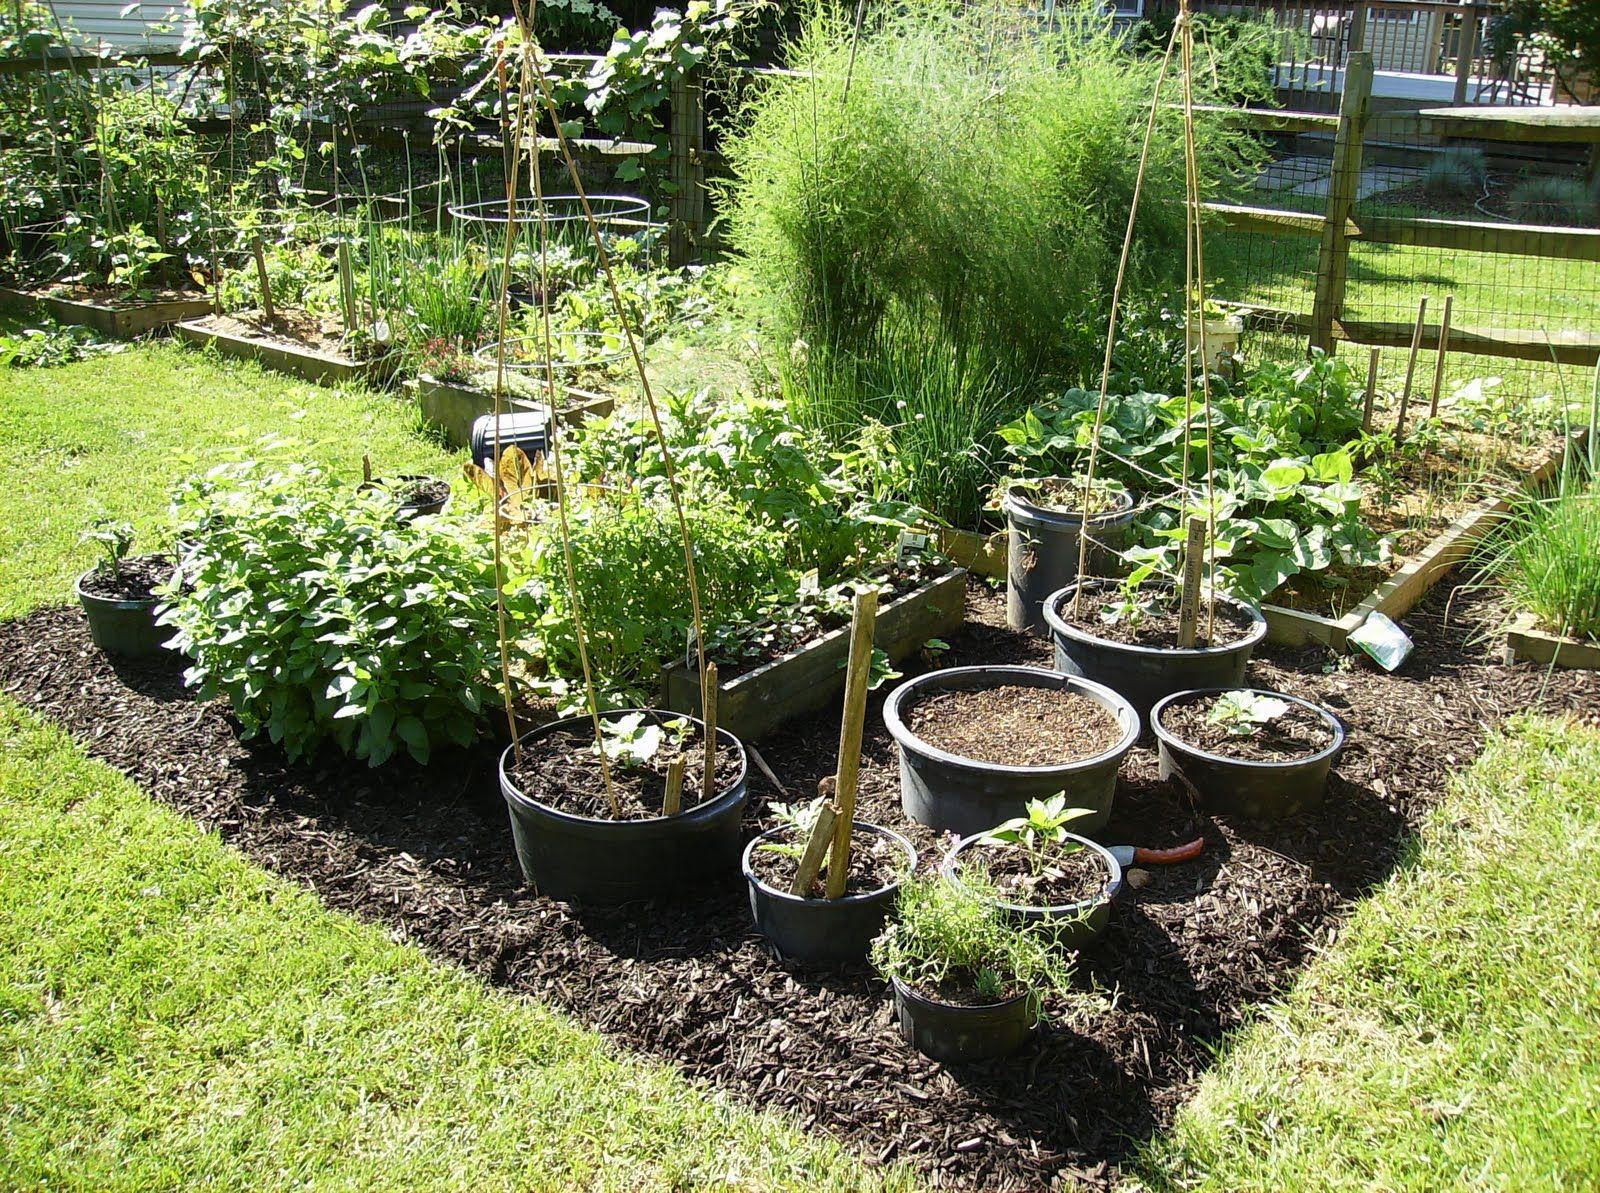 Gardening Idea Vegetable Container Garden - Get great ideas for ...